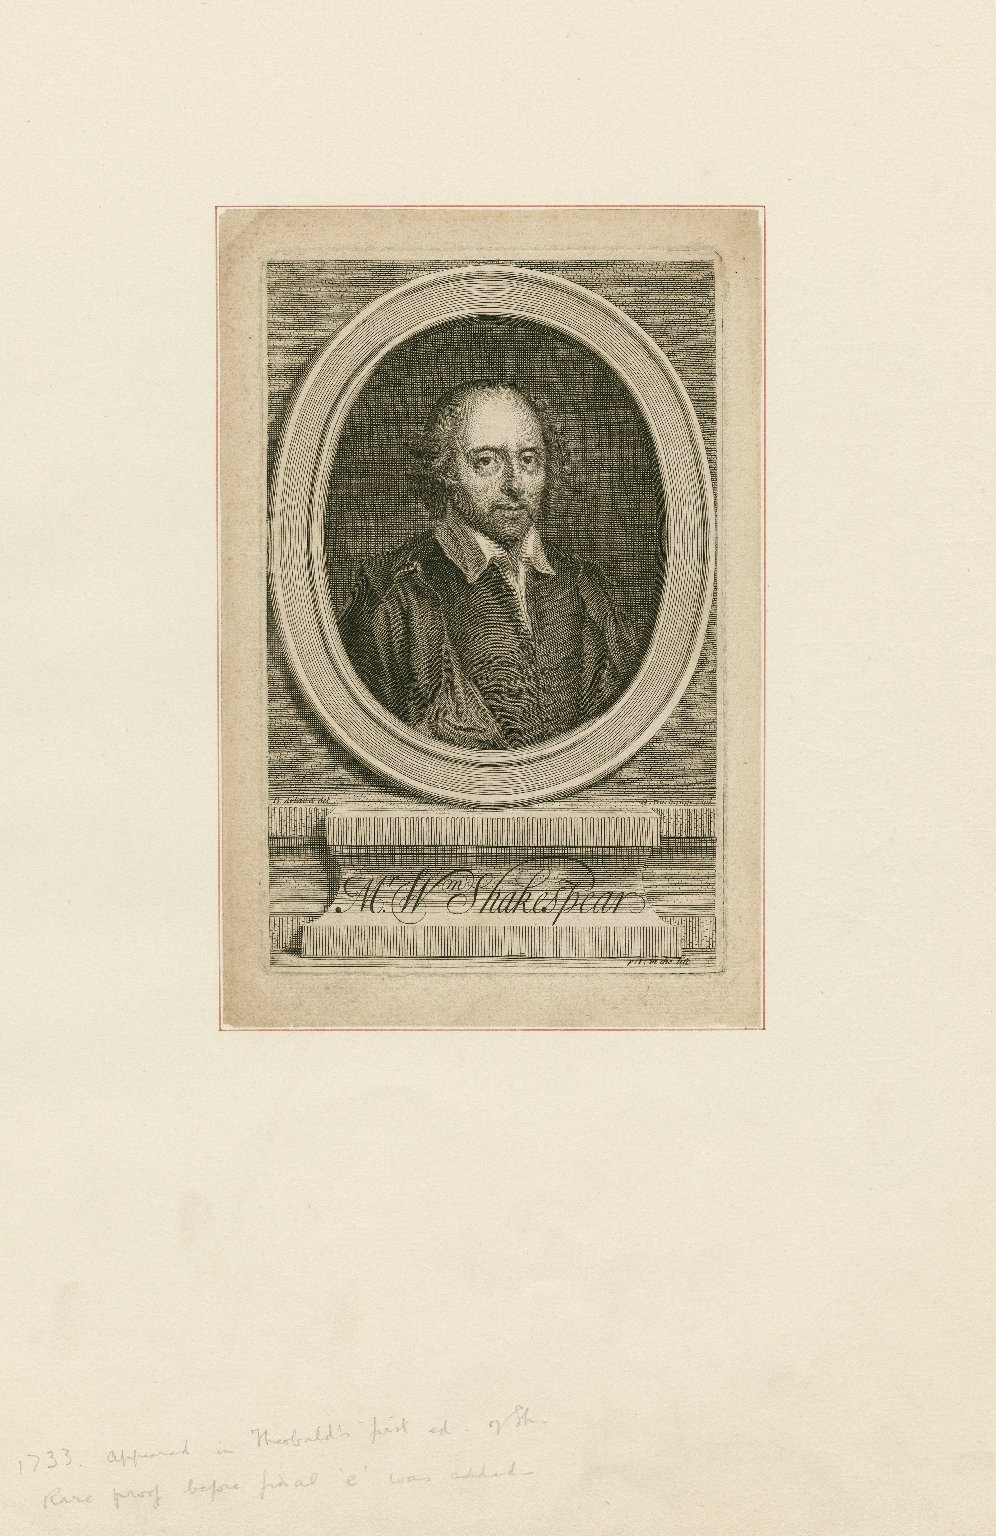 Mr. Wm. Shakespear [graphic] / B. Arlaud, del. ; G. Duchange, scul.